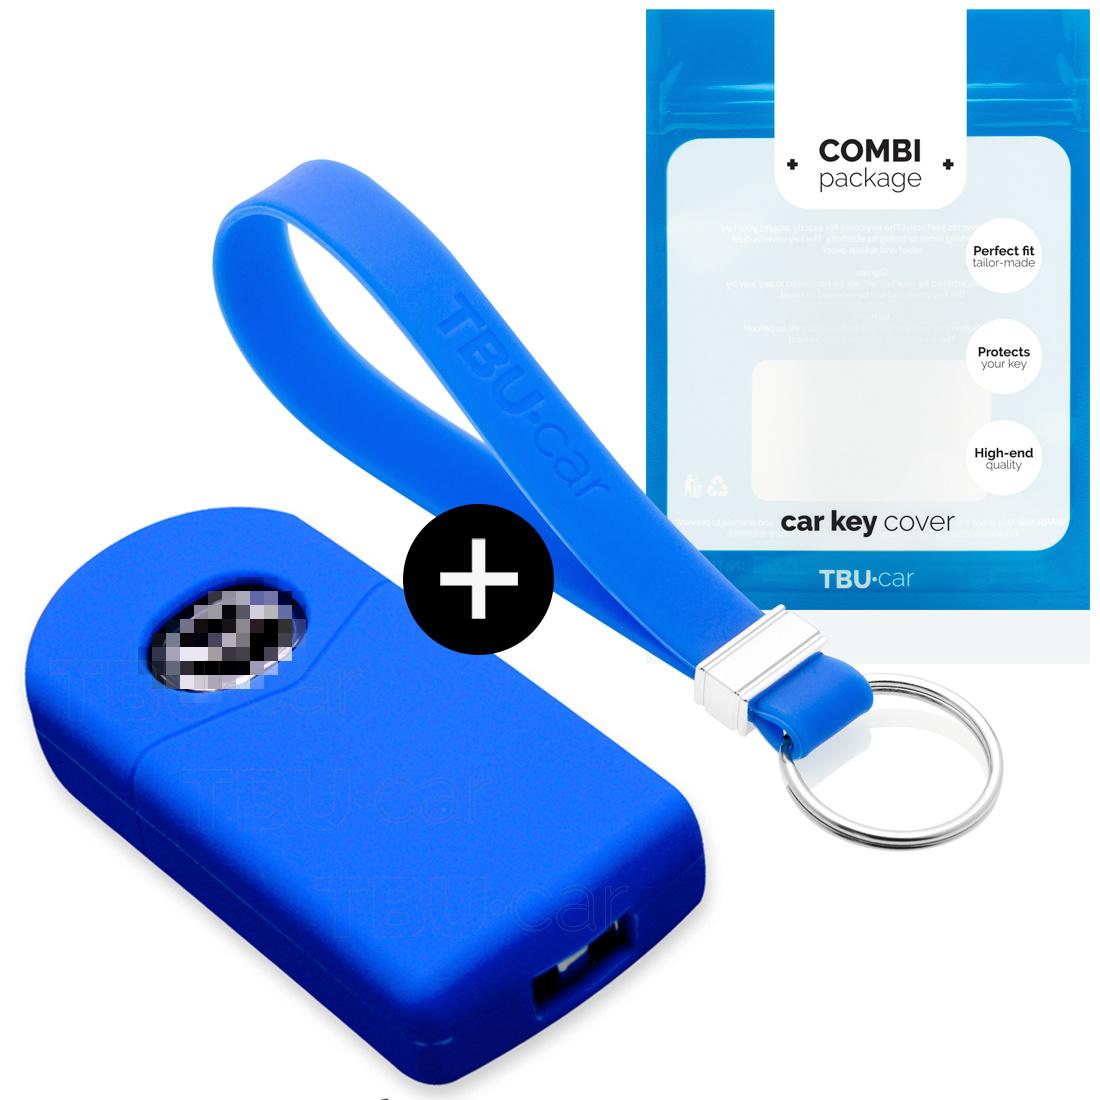 TBU car TBU car Autoschlüssel Hülle kompatibel mit Mazda 2 Tasten - Schutzhülle aus Silikon - Auto Schlüsselhülle Cover in Blau